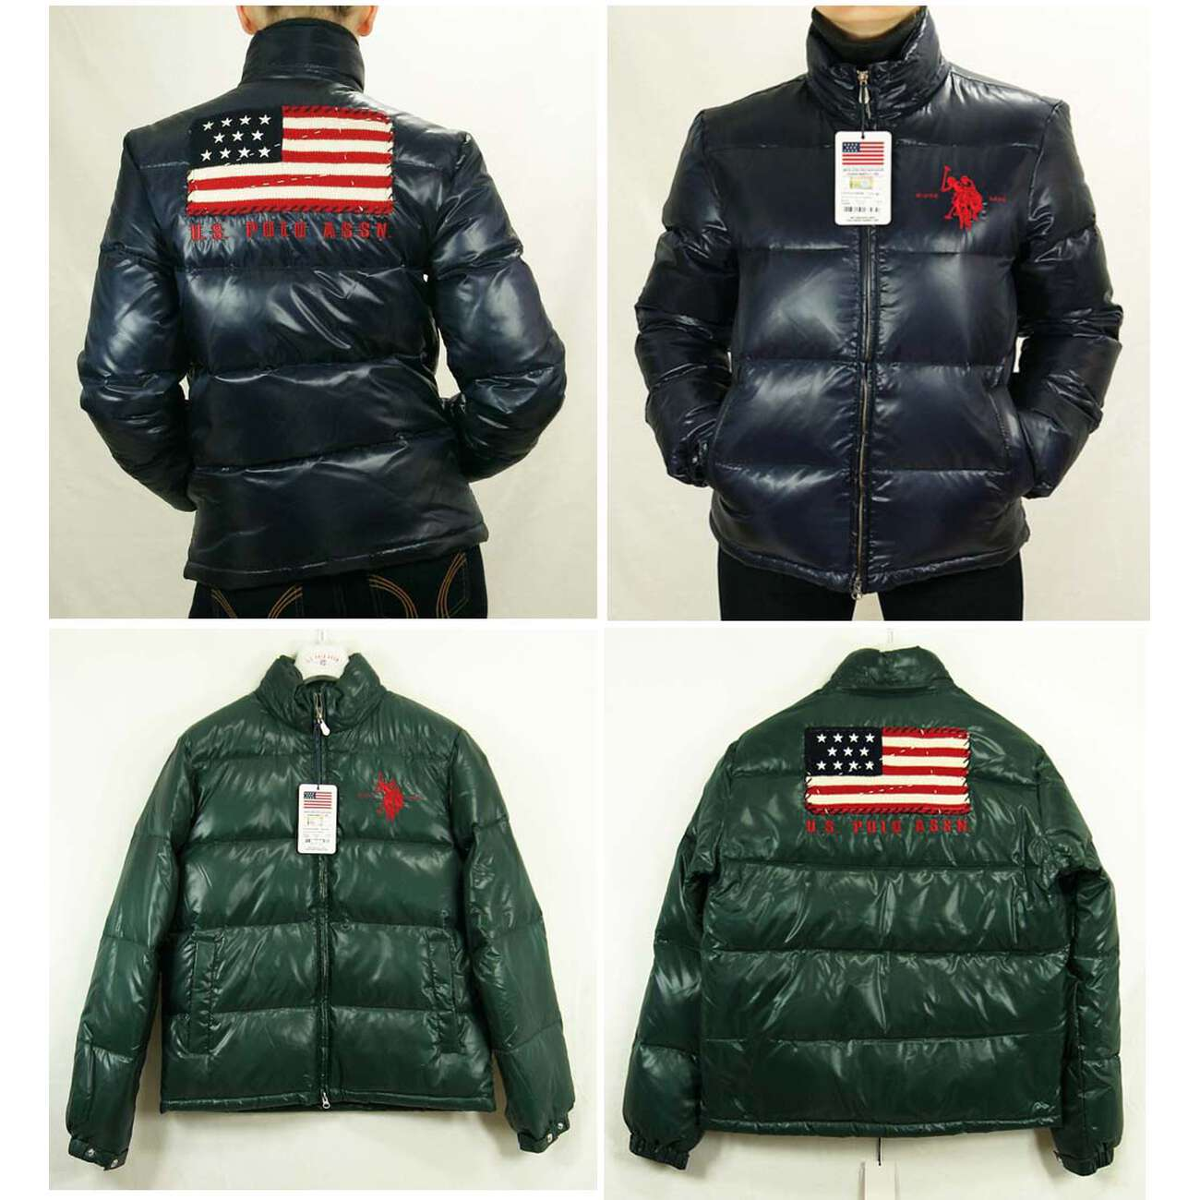 3679e62b1c2 US Polo ASSN USA Flagge WinterJacke Jacke Daunenjacke Jacke Steppjacke ...